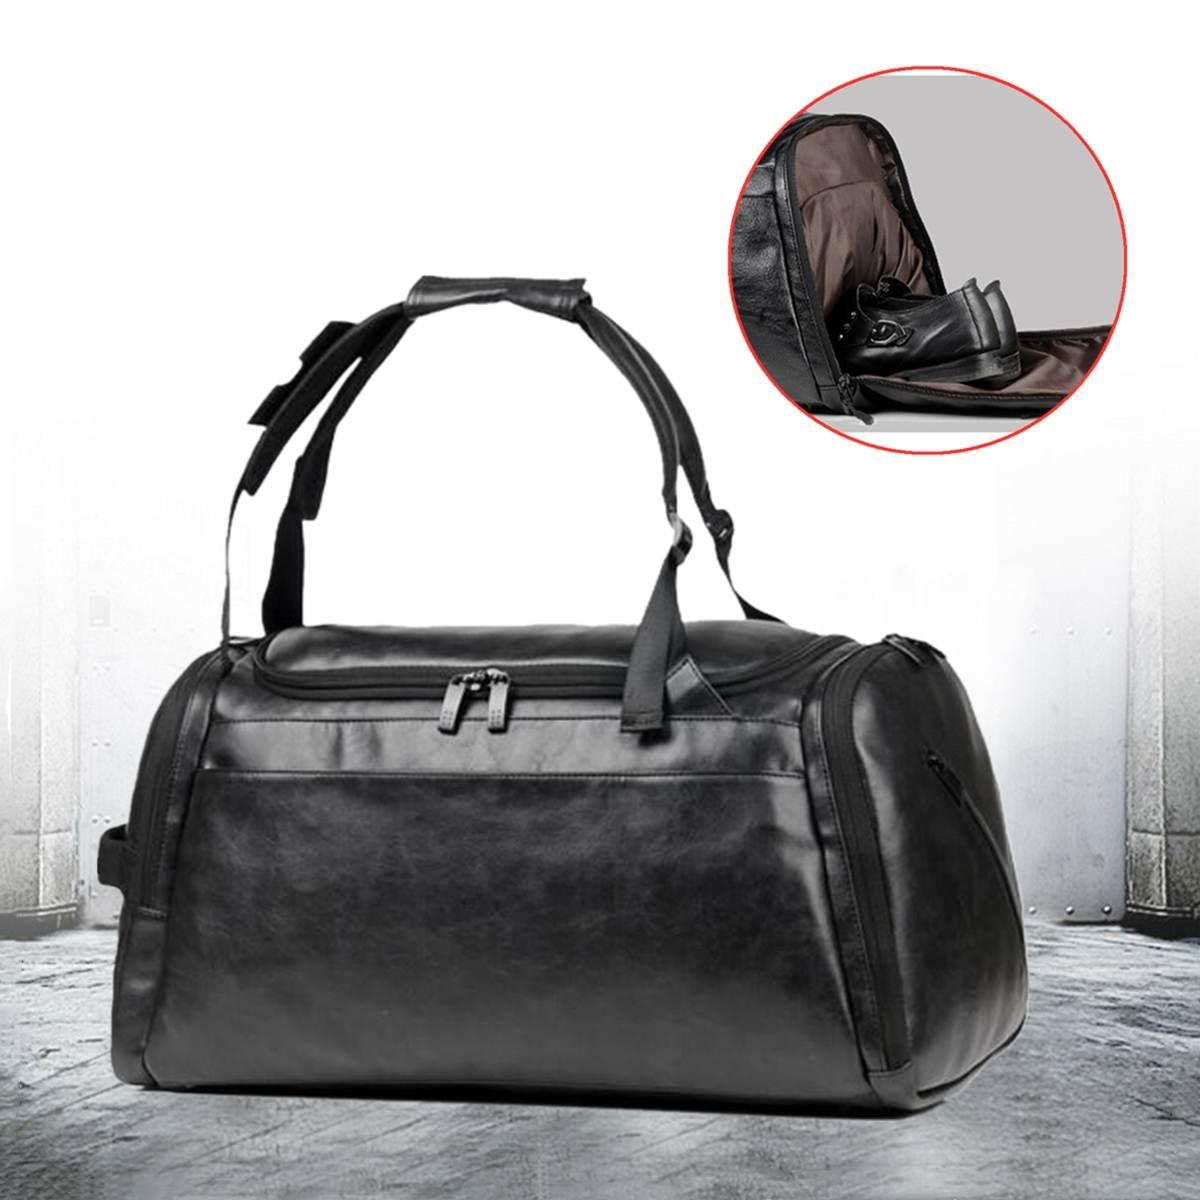 Multifunctional Leather Men Women Luggage Travel Bag Large Capacity Duffle Bag Satchel Shoulder Gym Sports Handbag